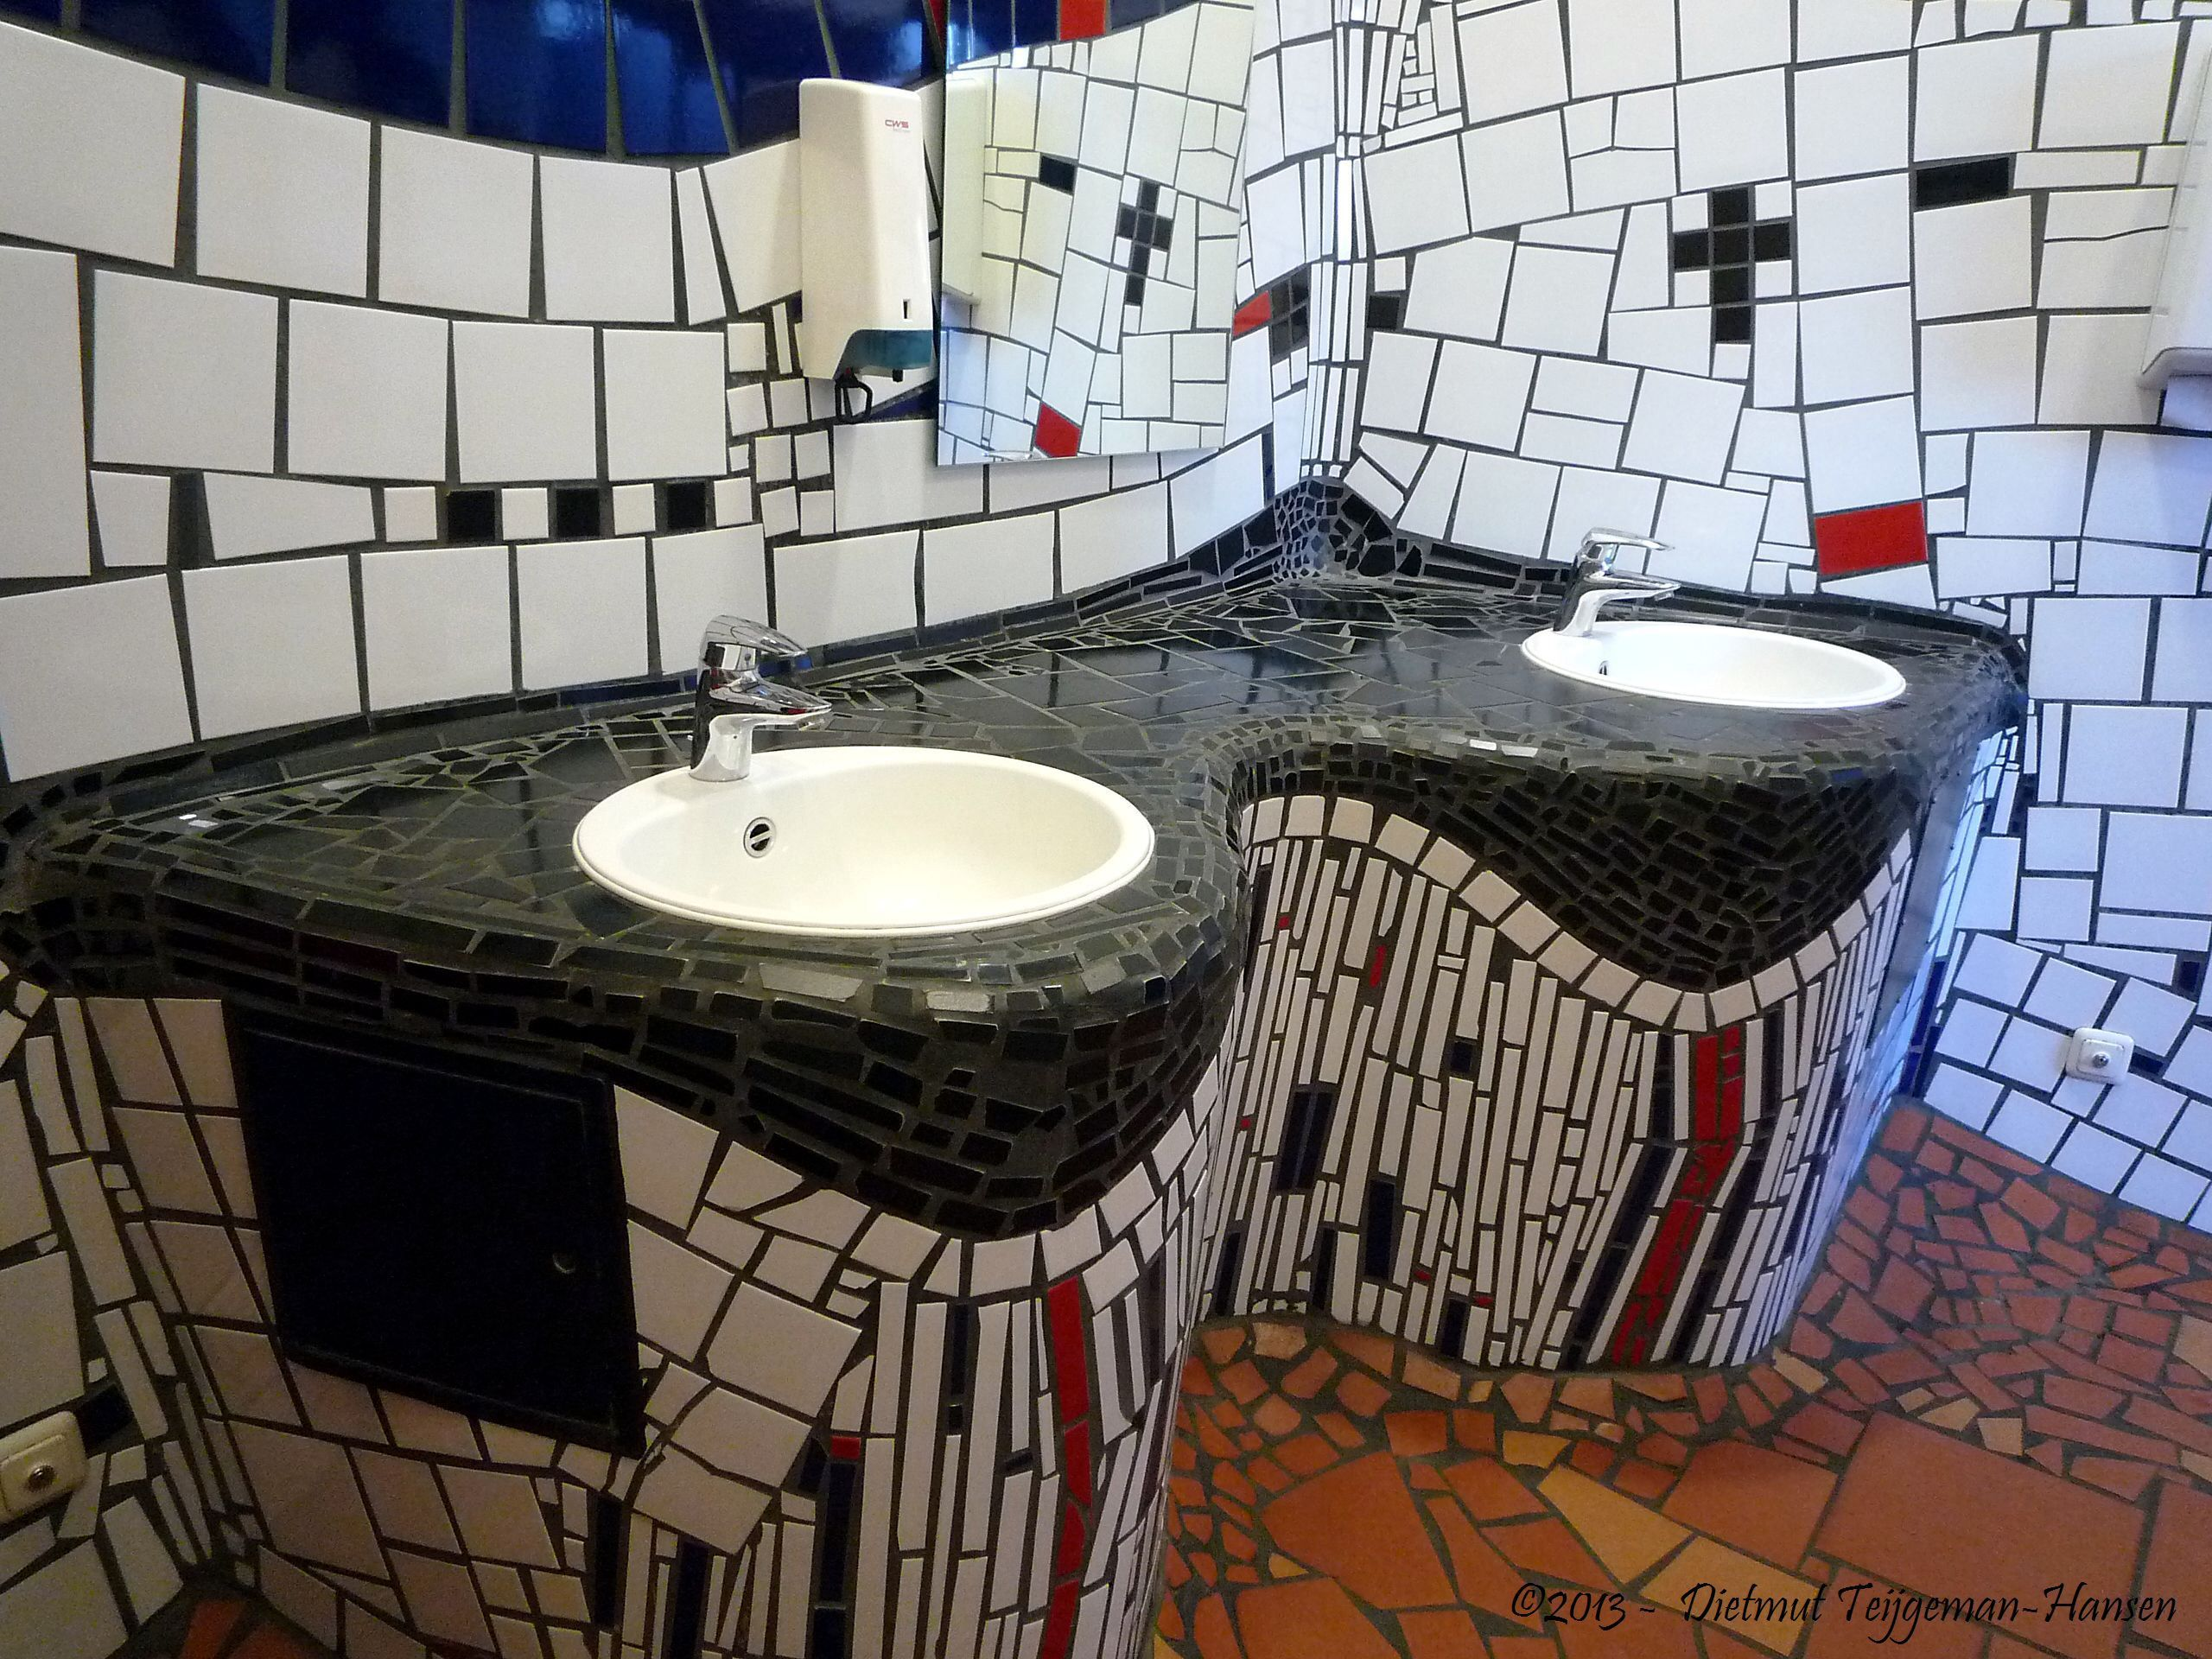 hundertwasser interior - google search | hundertwasser, Badezimmer gestaltung